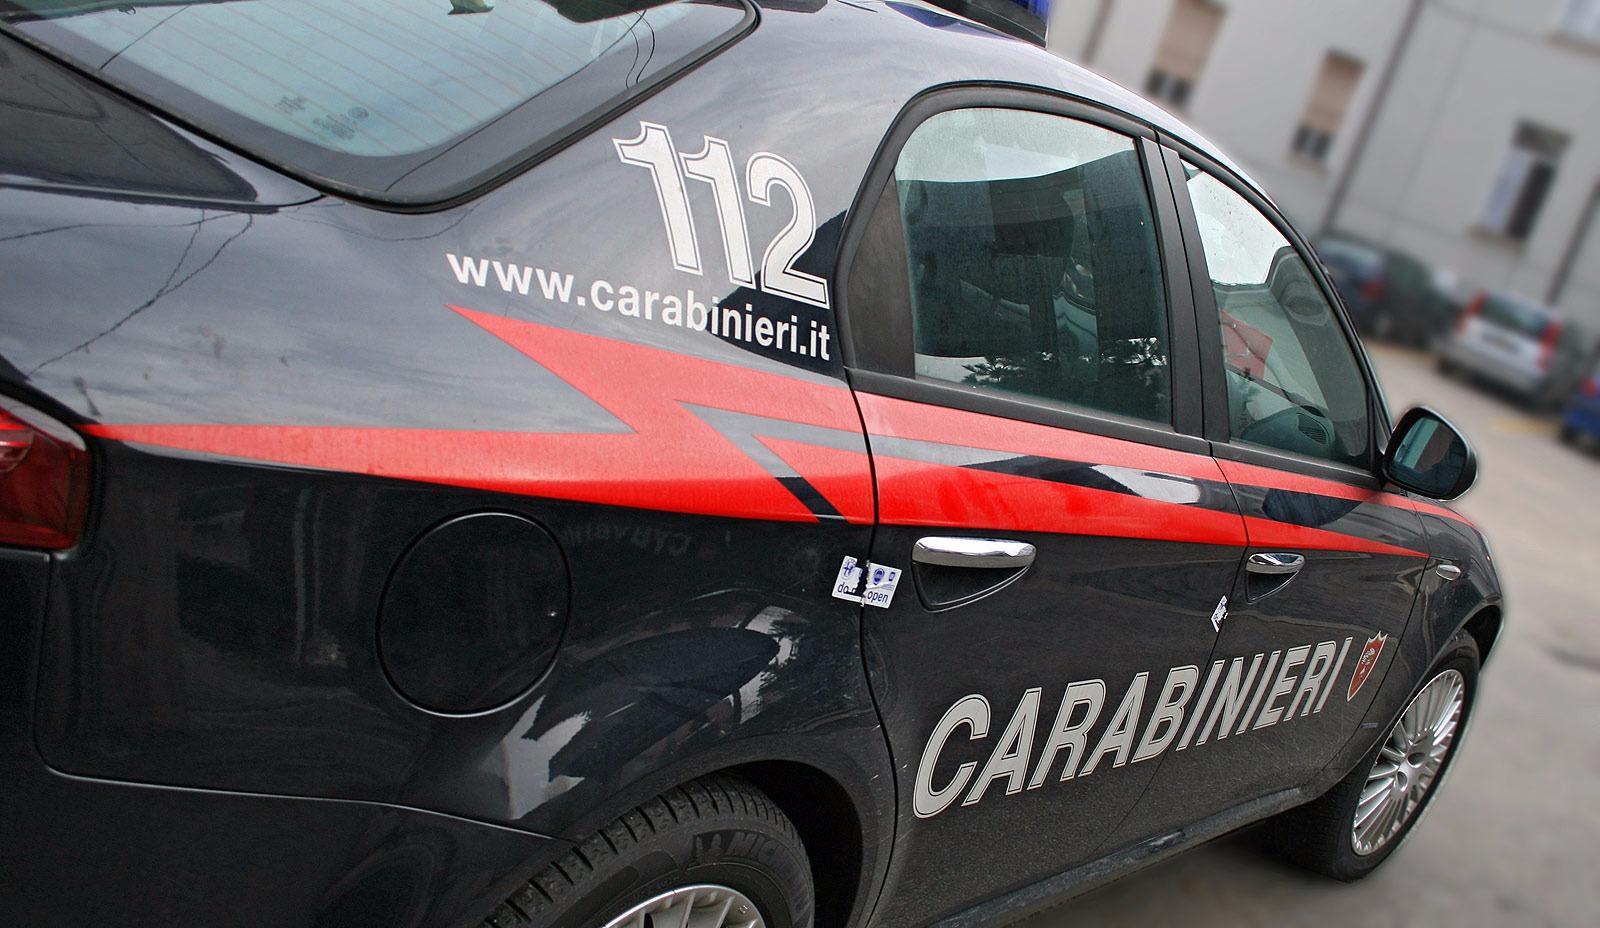 Ancora droga in città, spacciava hashish, arrestato viterbese 45enne